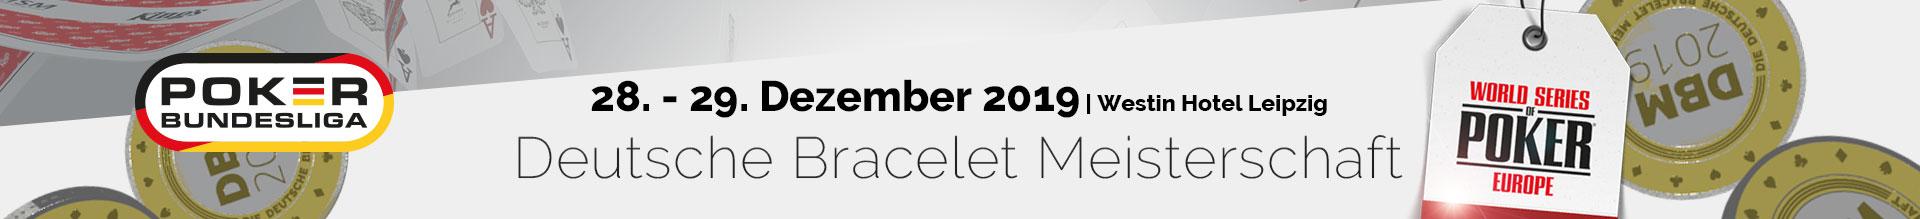 Deutsche Bracelet Meisterschaft 2019